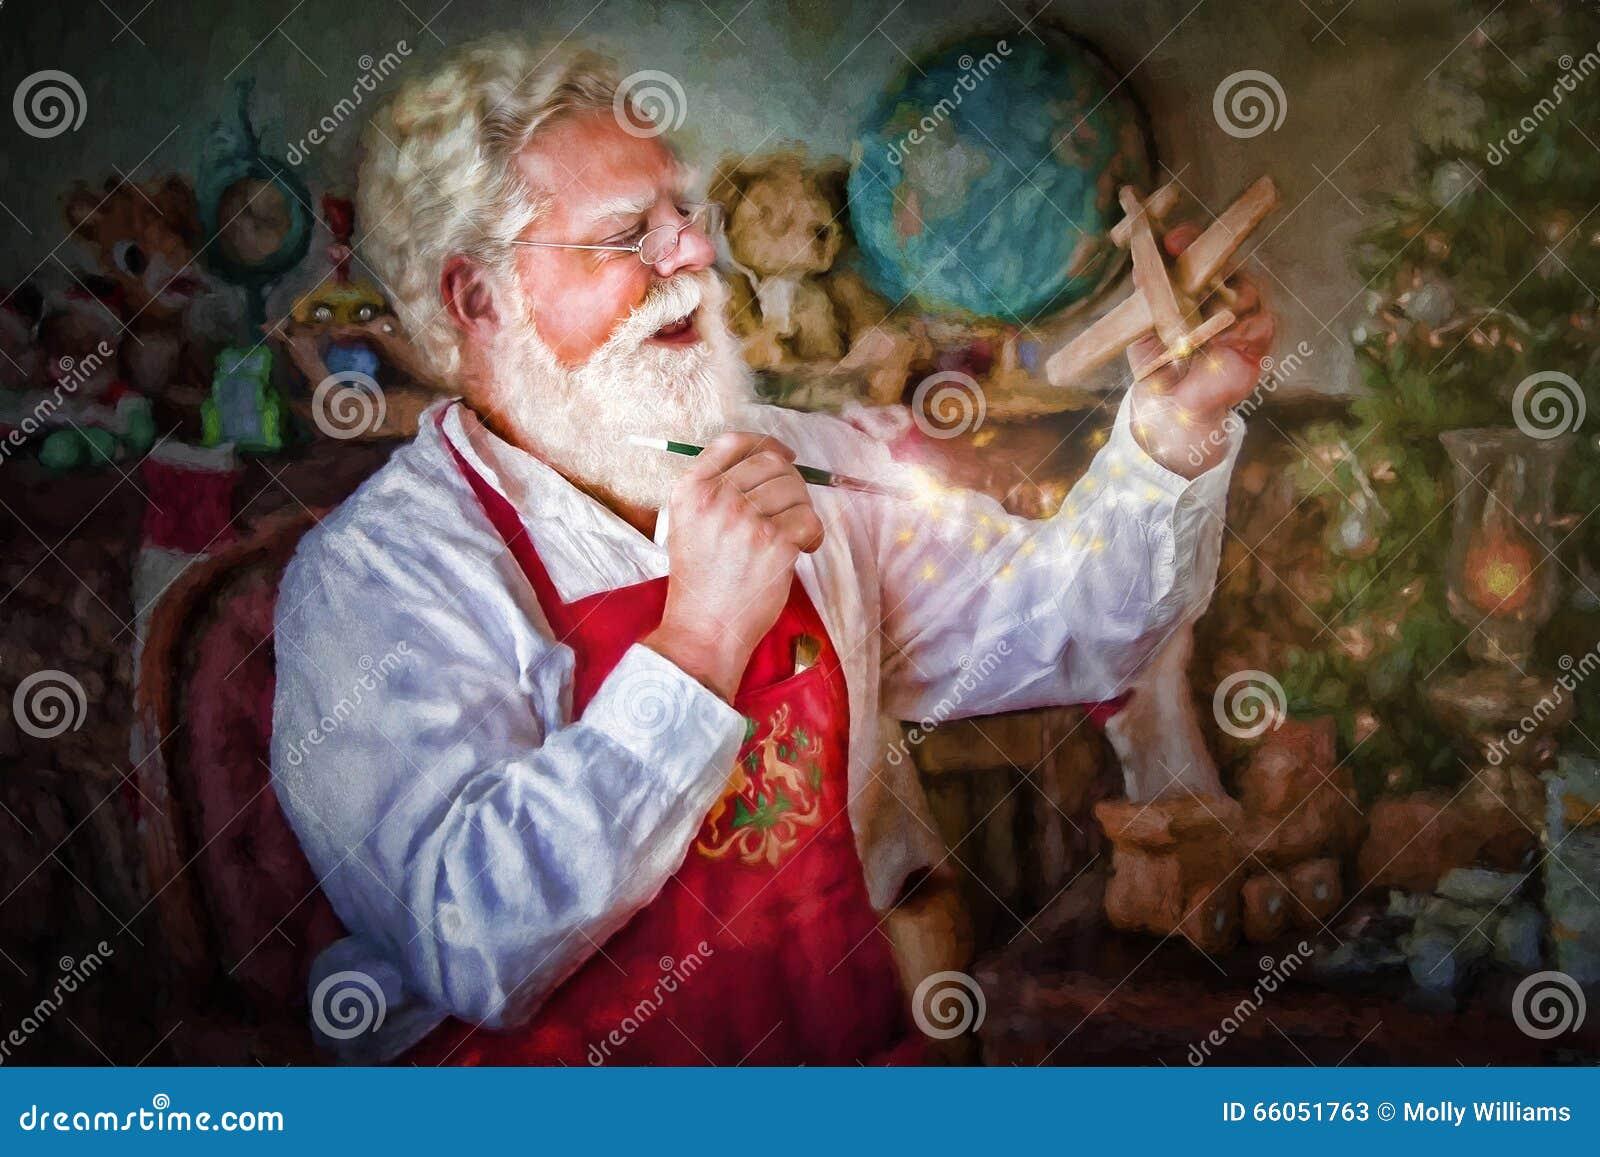 Santa Claus Painting Toys